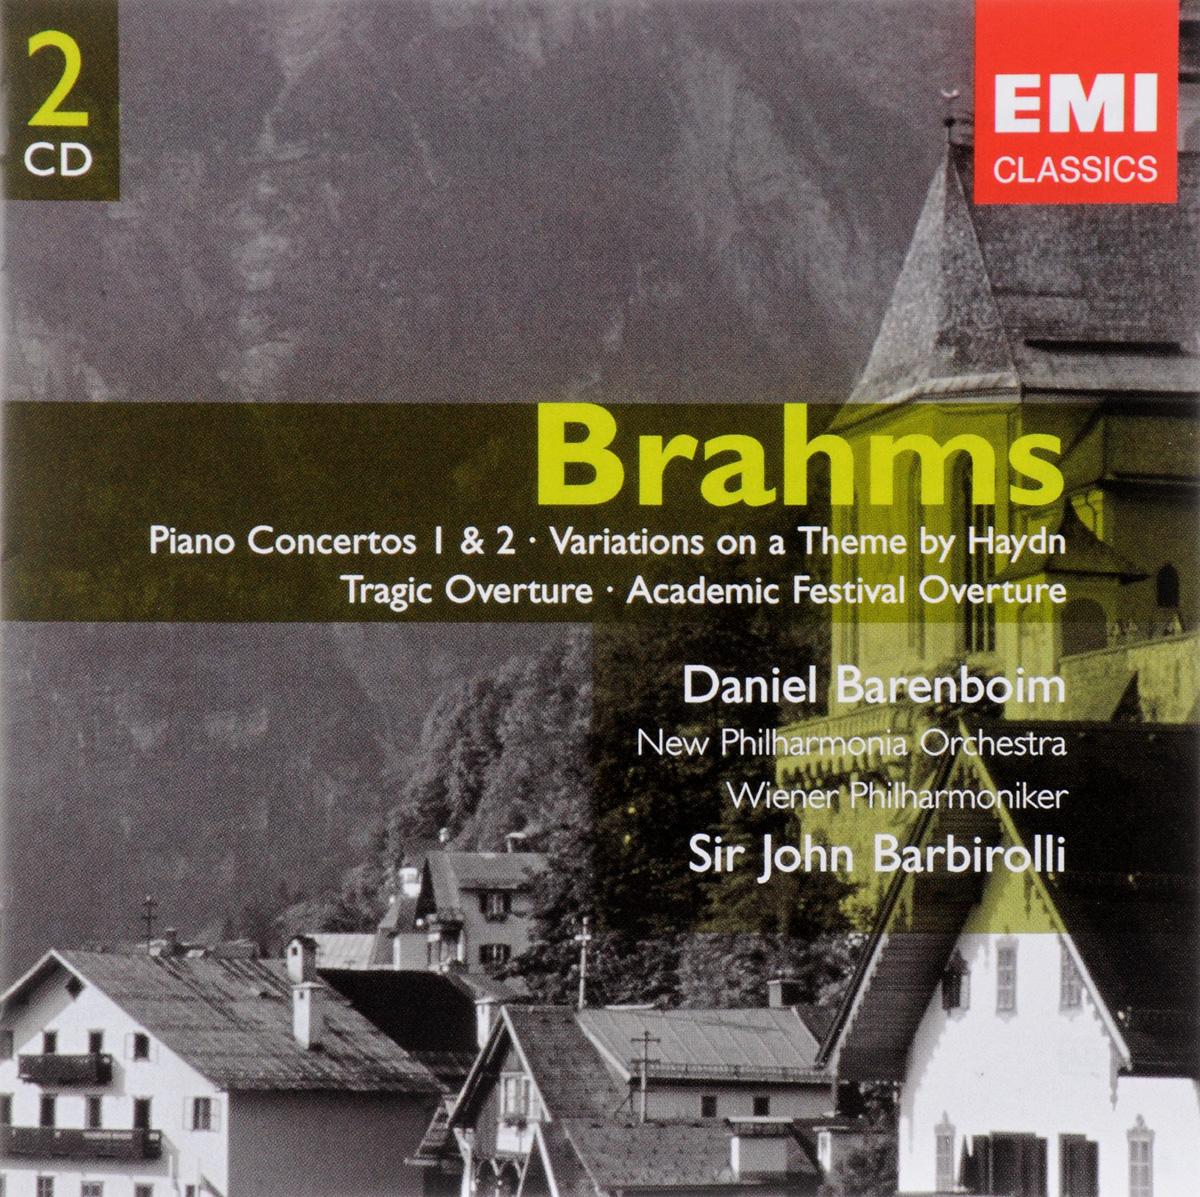 лучшая цена Иоганнес (Йоханнес) Брамс Johannes Brahms. Piano Concertos Nos 1 & 2, Academic Festival & Tragic Overtures, Variations On A Theme Of Haydn (2 CD)